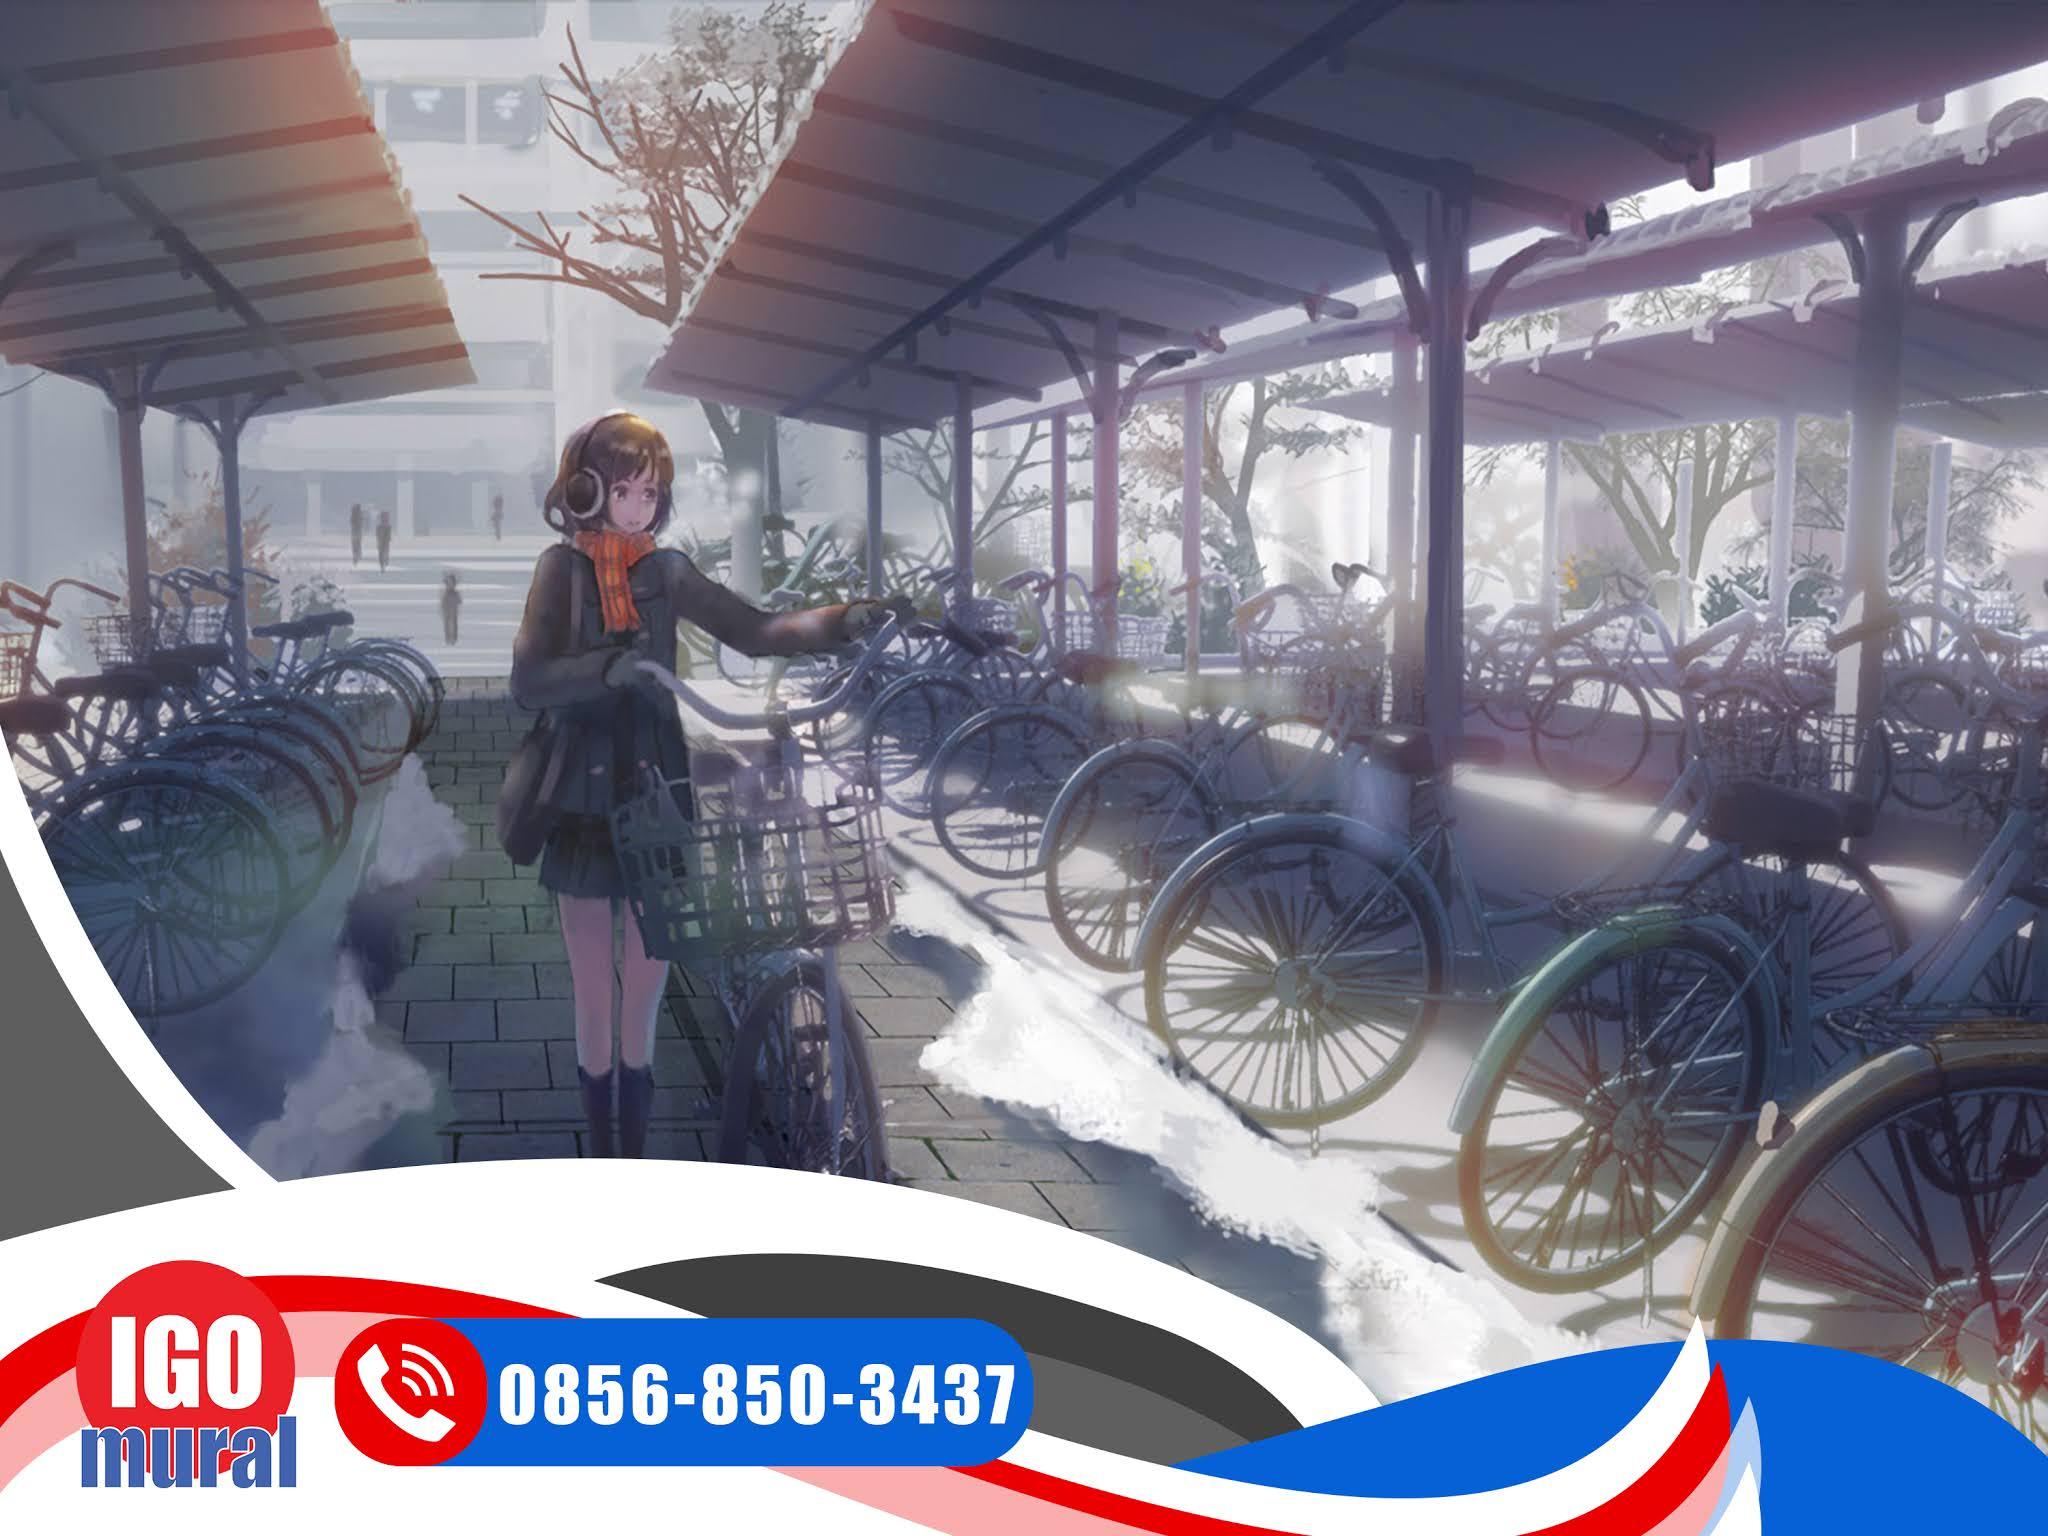 Wallpaper Cutsom Biker